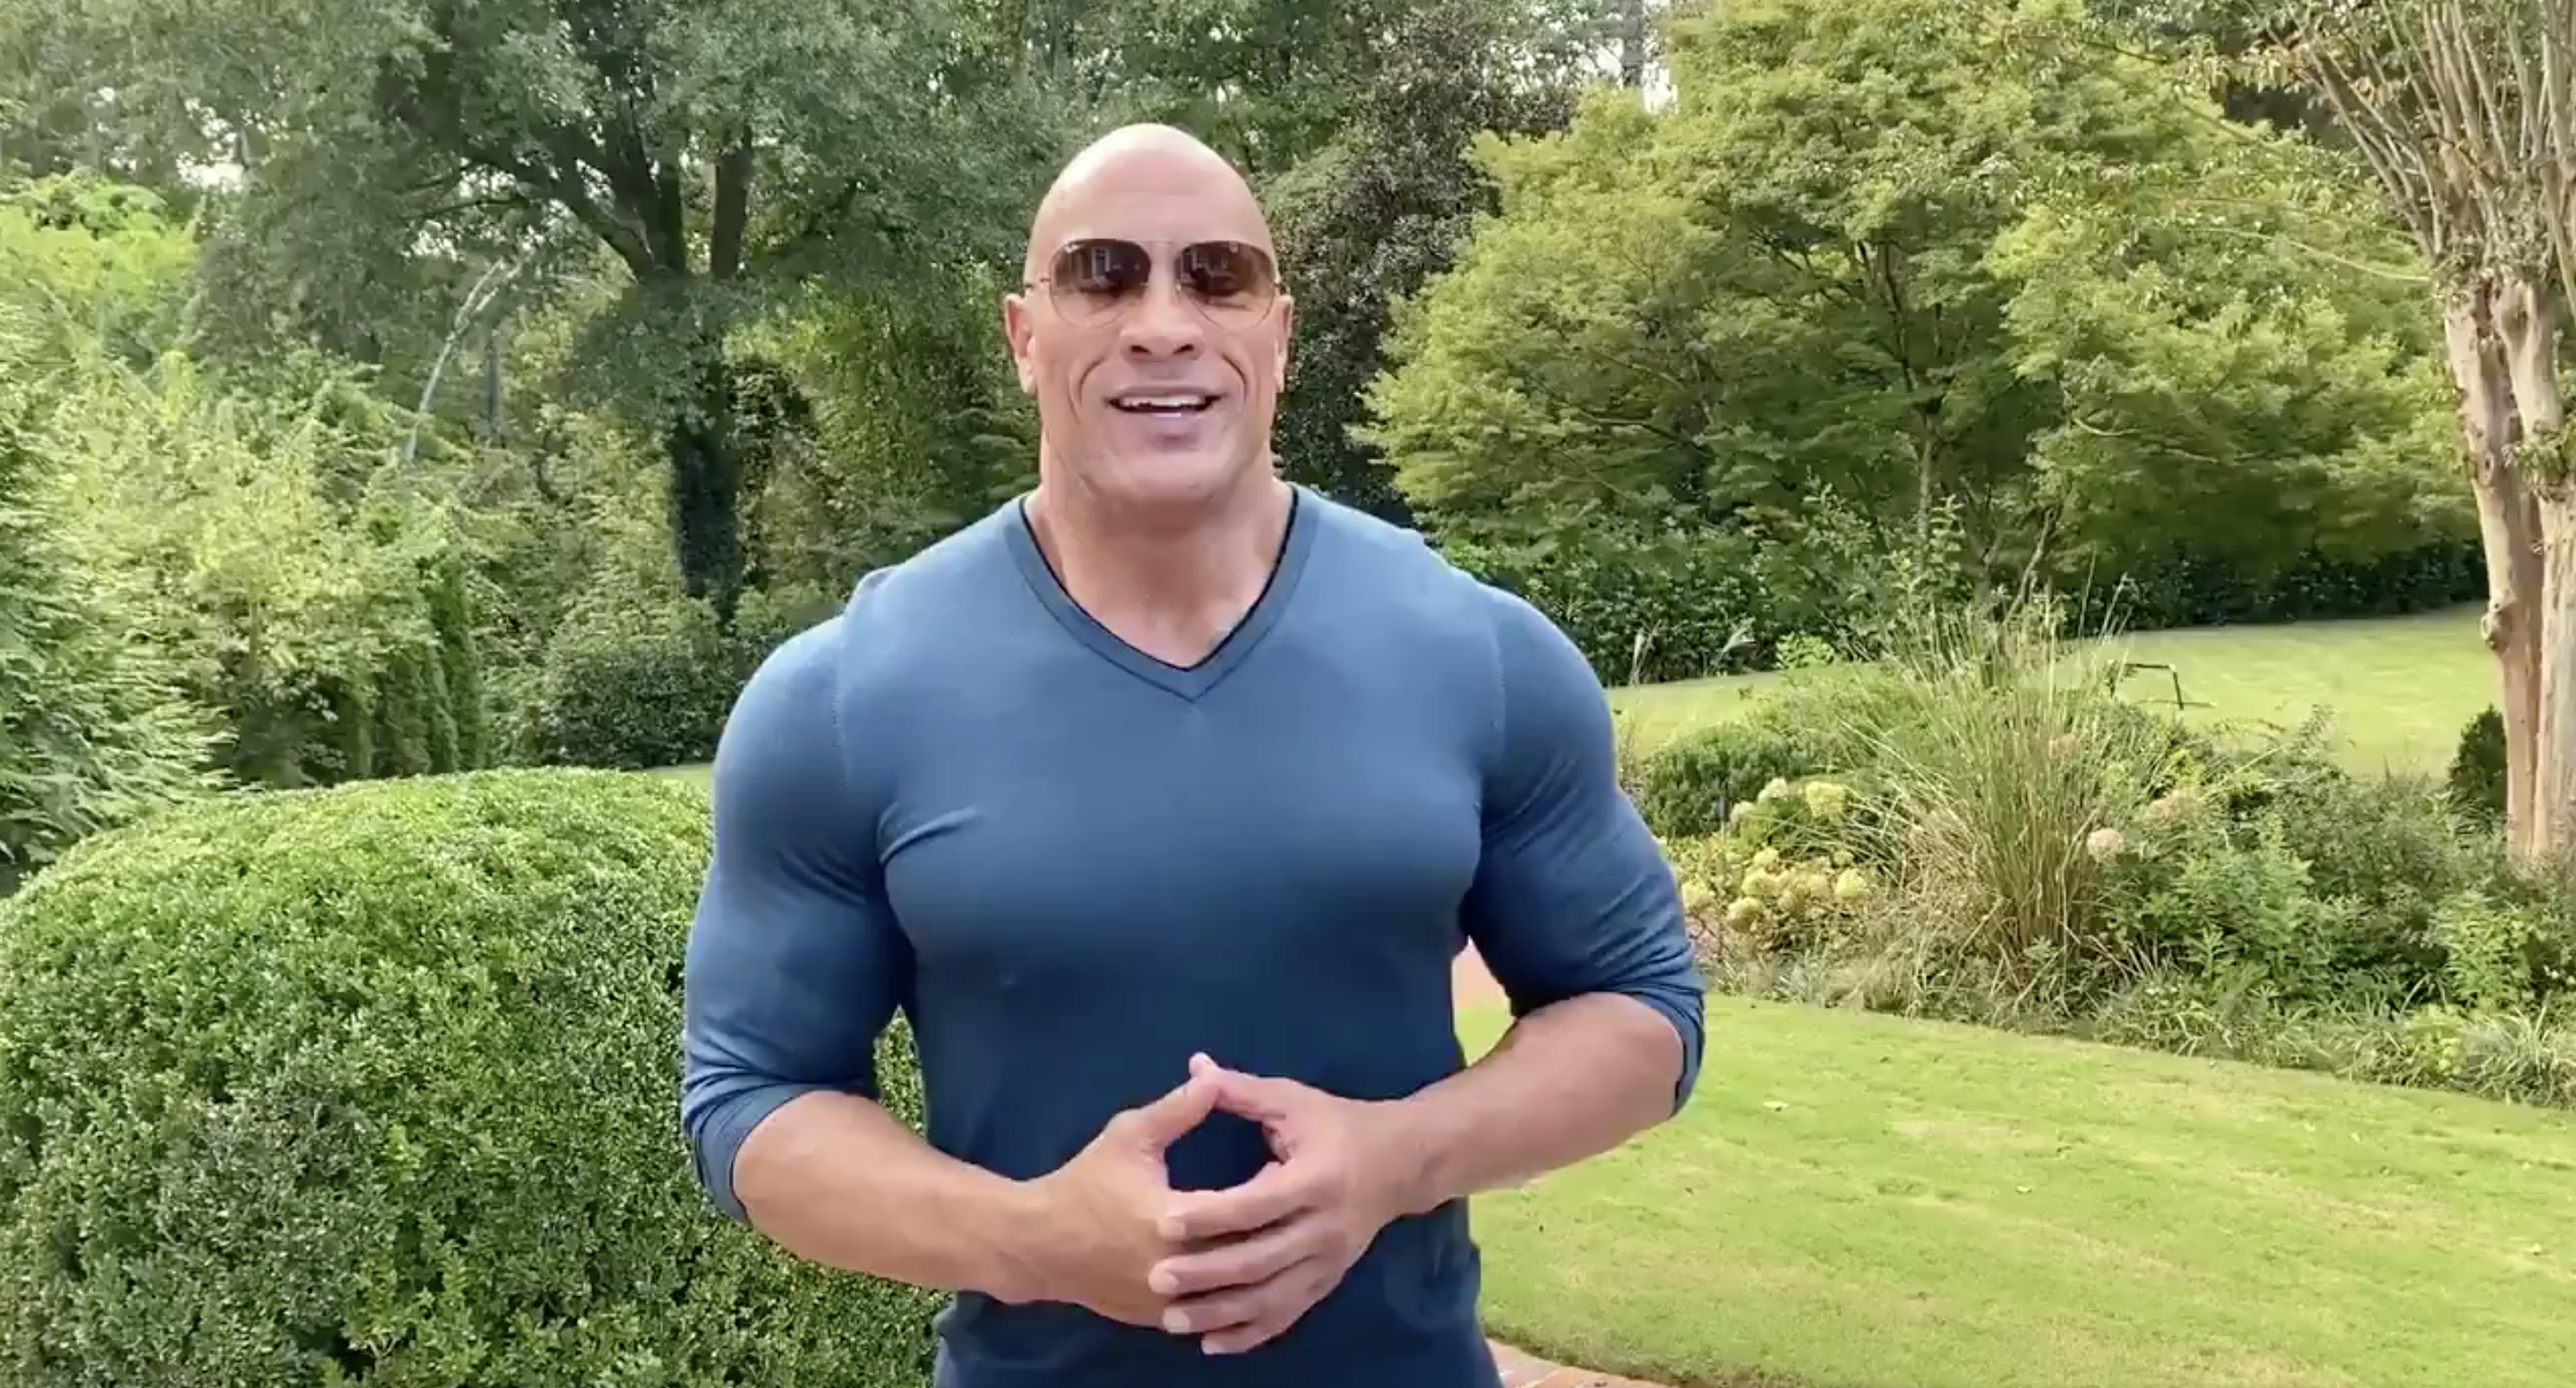 Dwayne 'The Rock' Johnson Supports Joe Biden and Kamala Harris in His First-Ever Endorsement